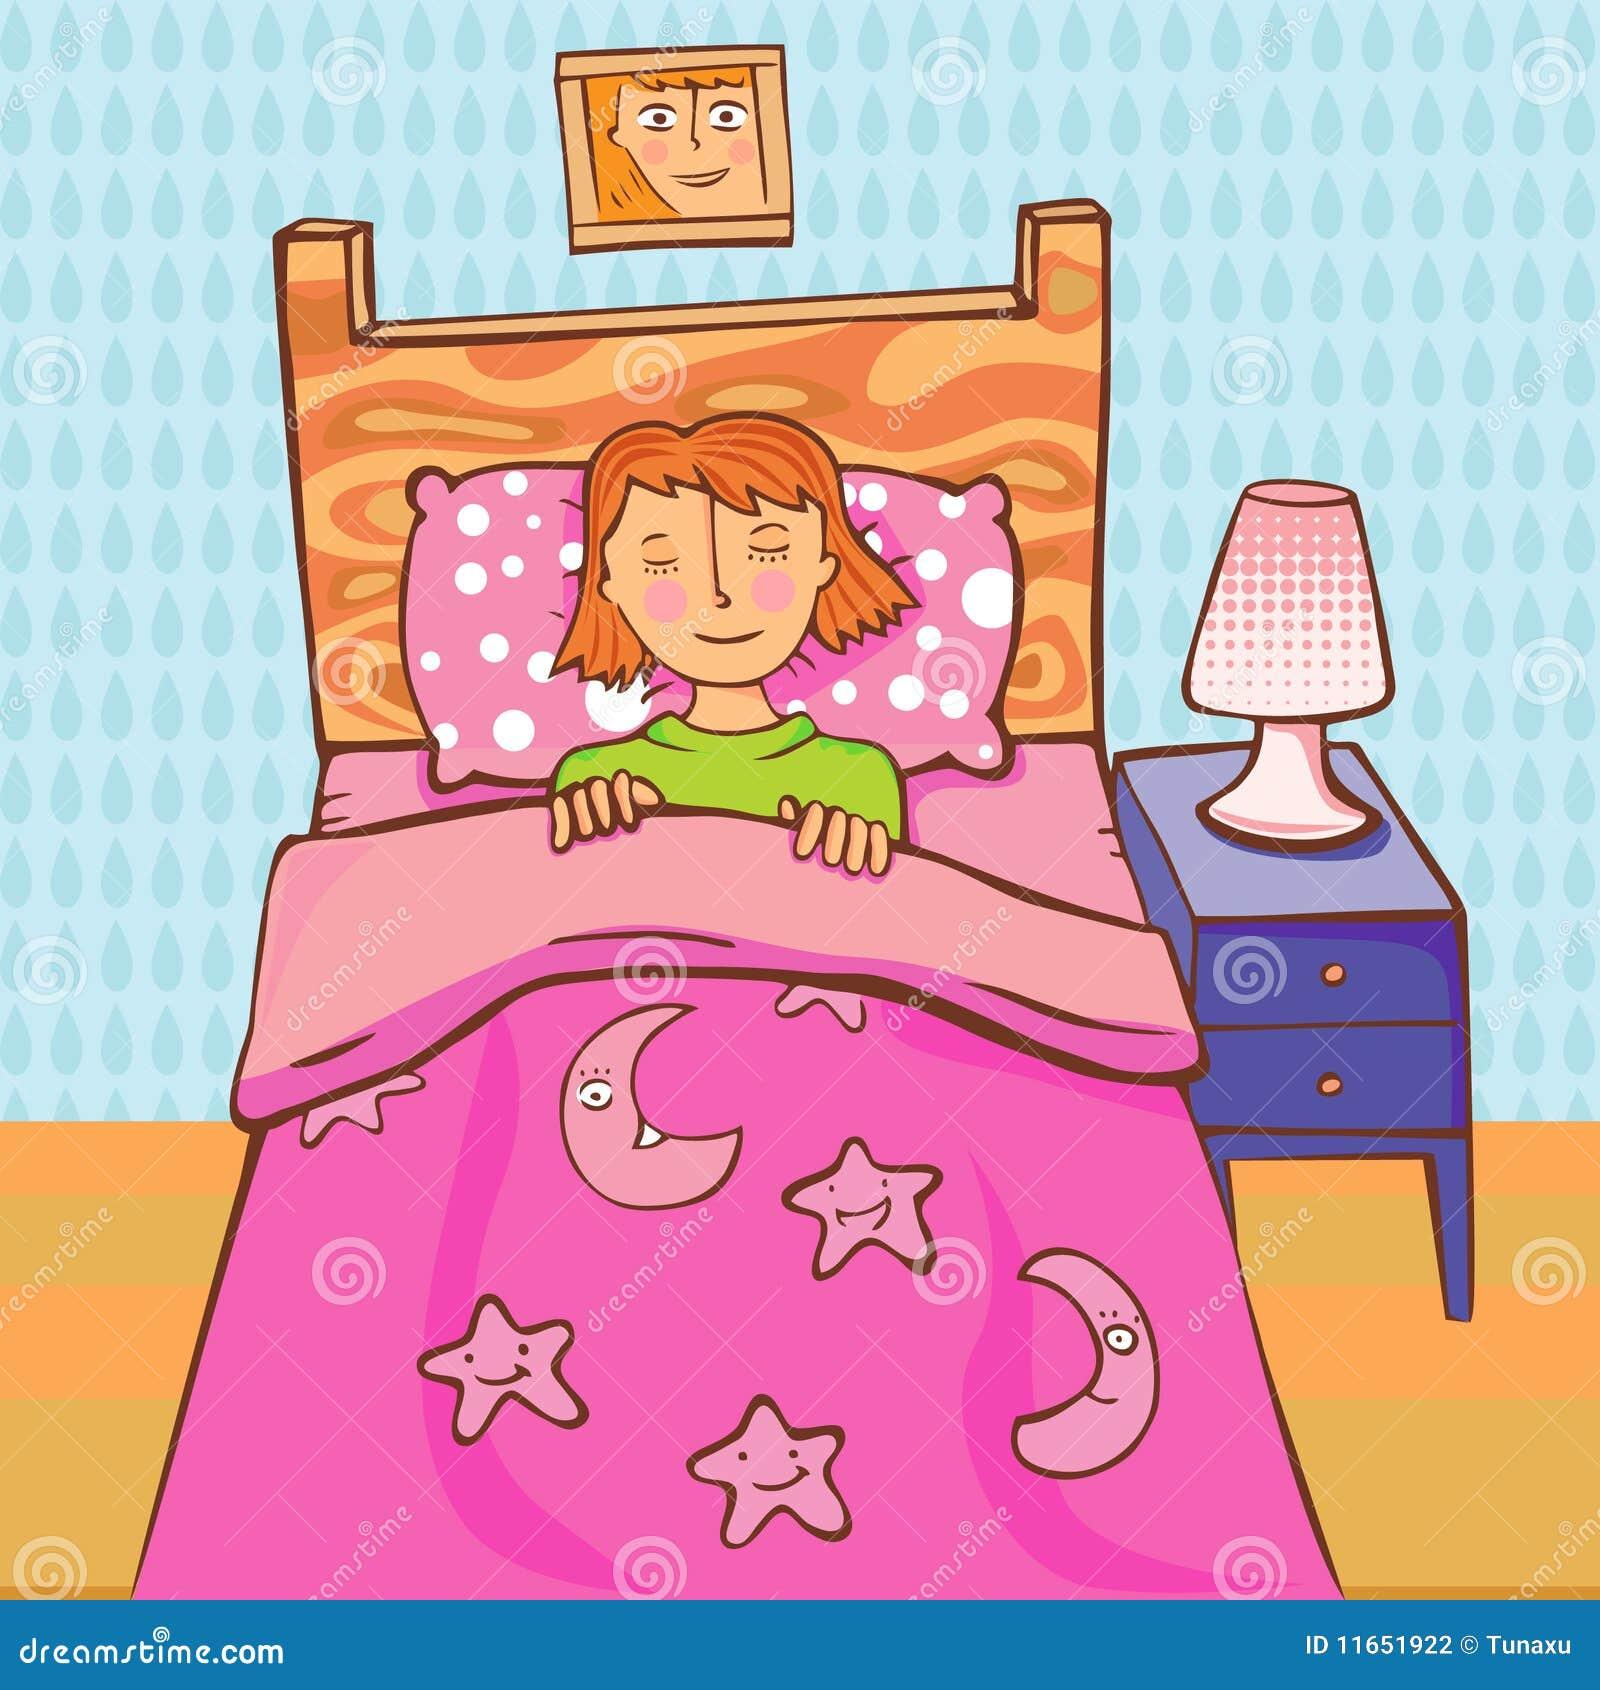 Sleeping girl stock vector. Illustration of vector, star ...